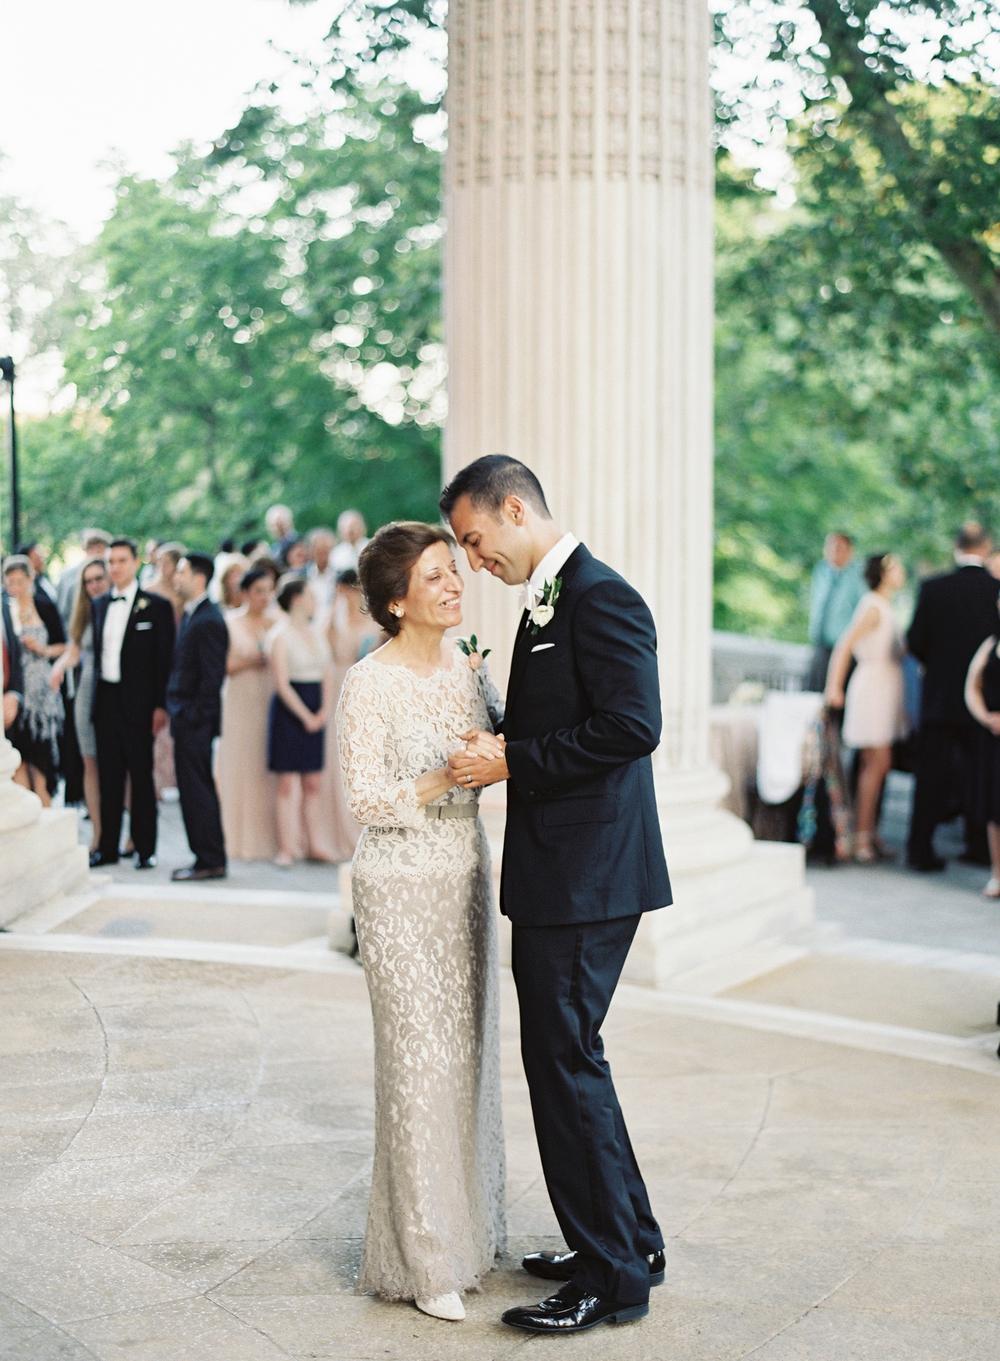 Vicki Grafton Photography - Fine Art DC Virginia Charlottesville Film Wedding Photographer_0068.jpg